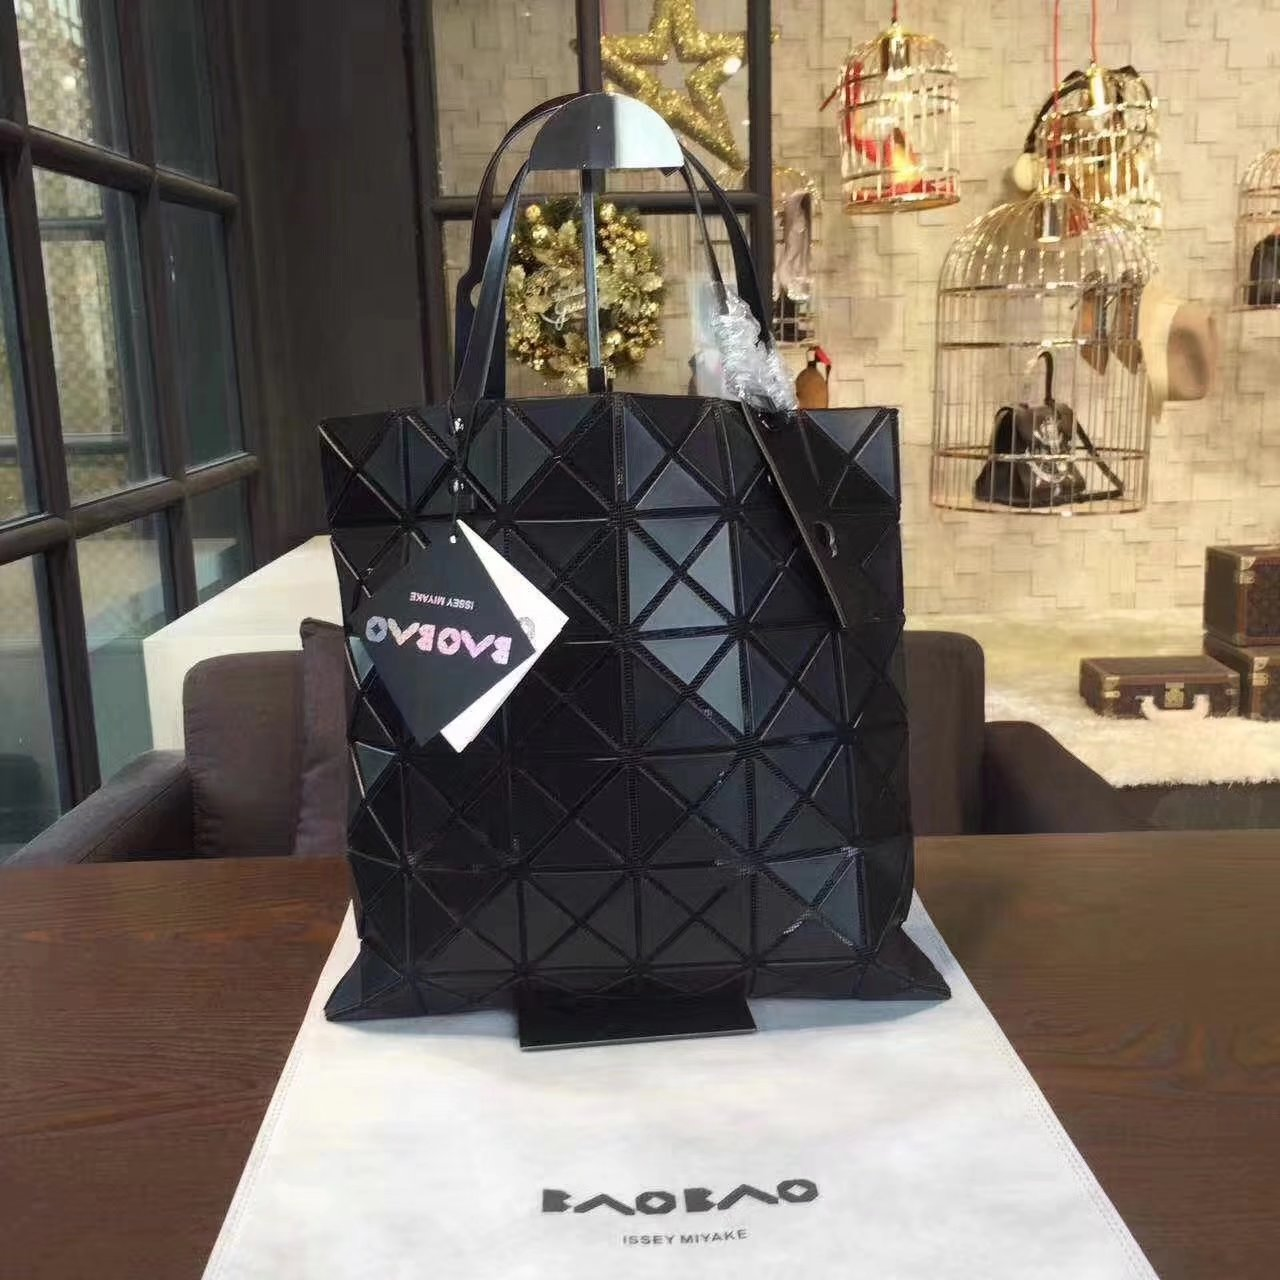 Issey Miyake Bao Bao Shopping Bag Black